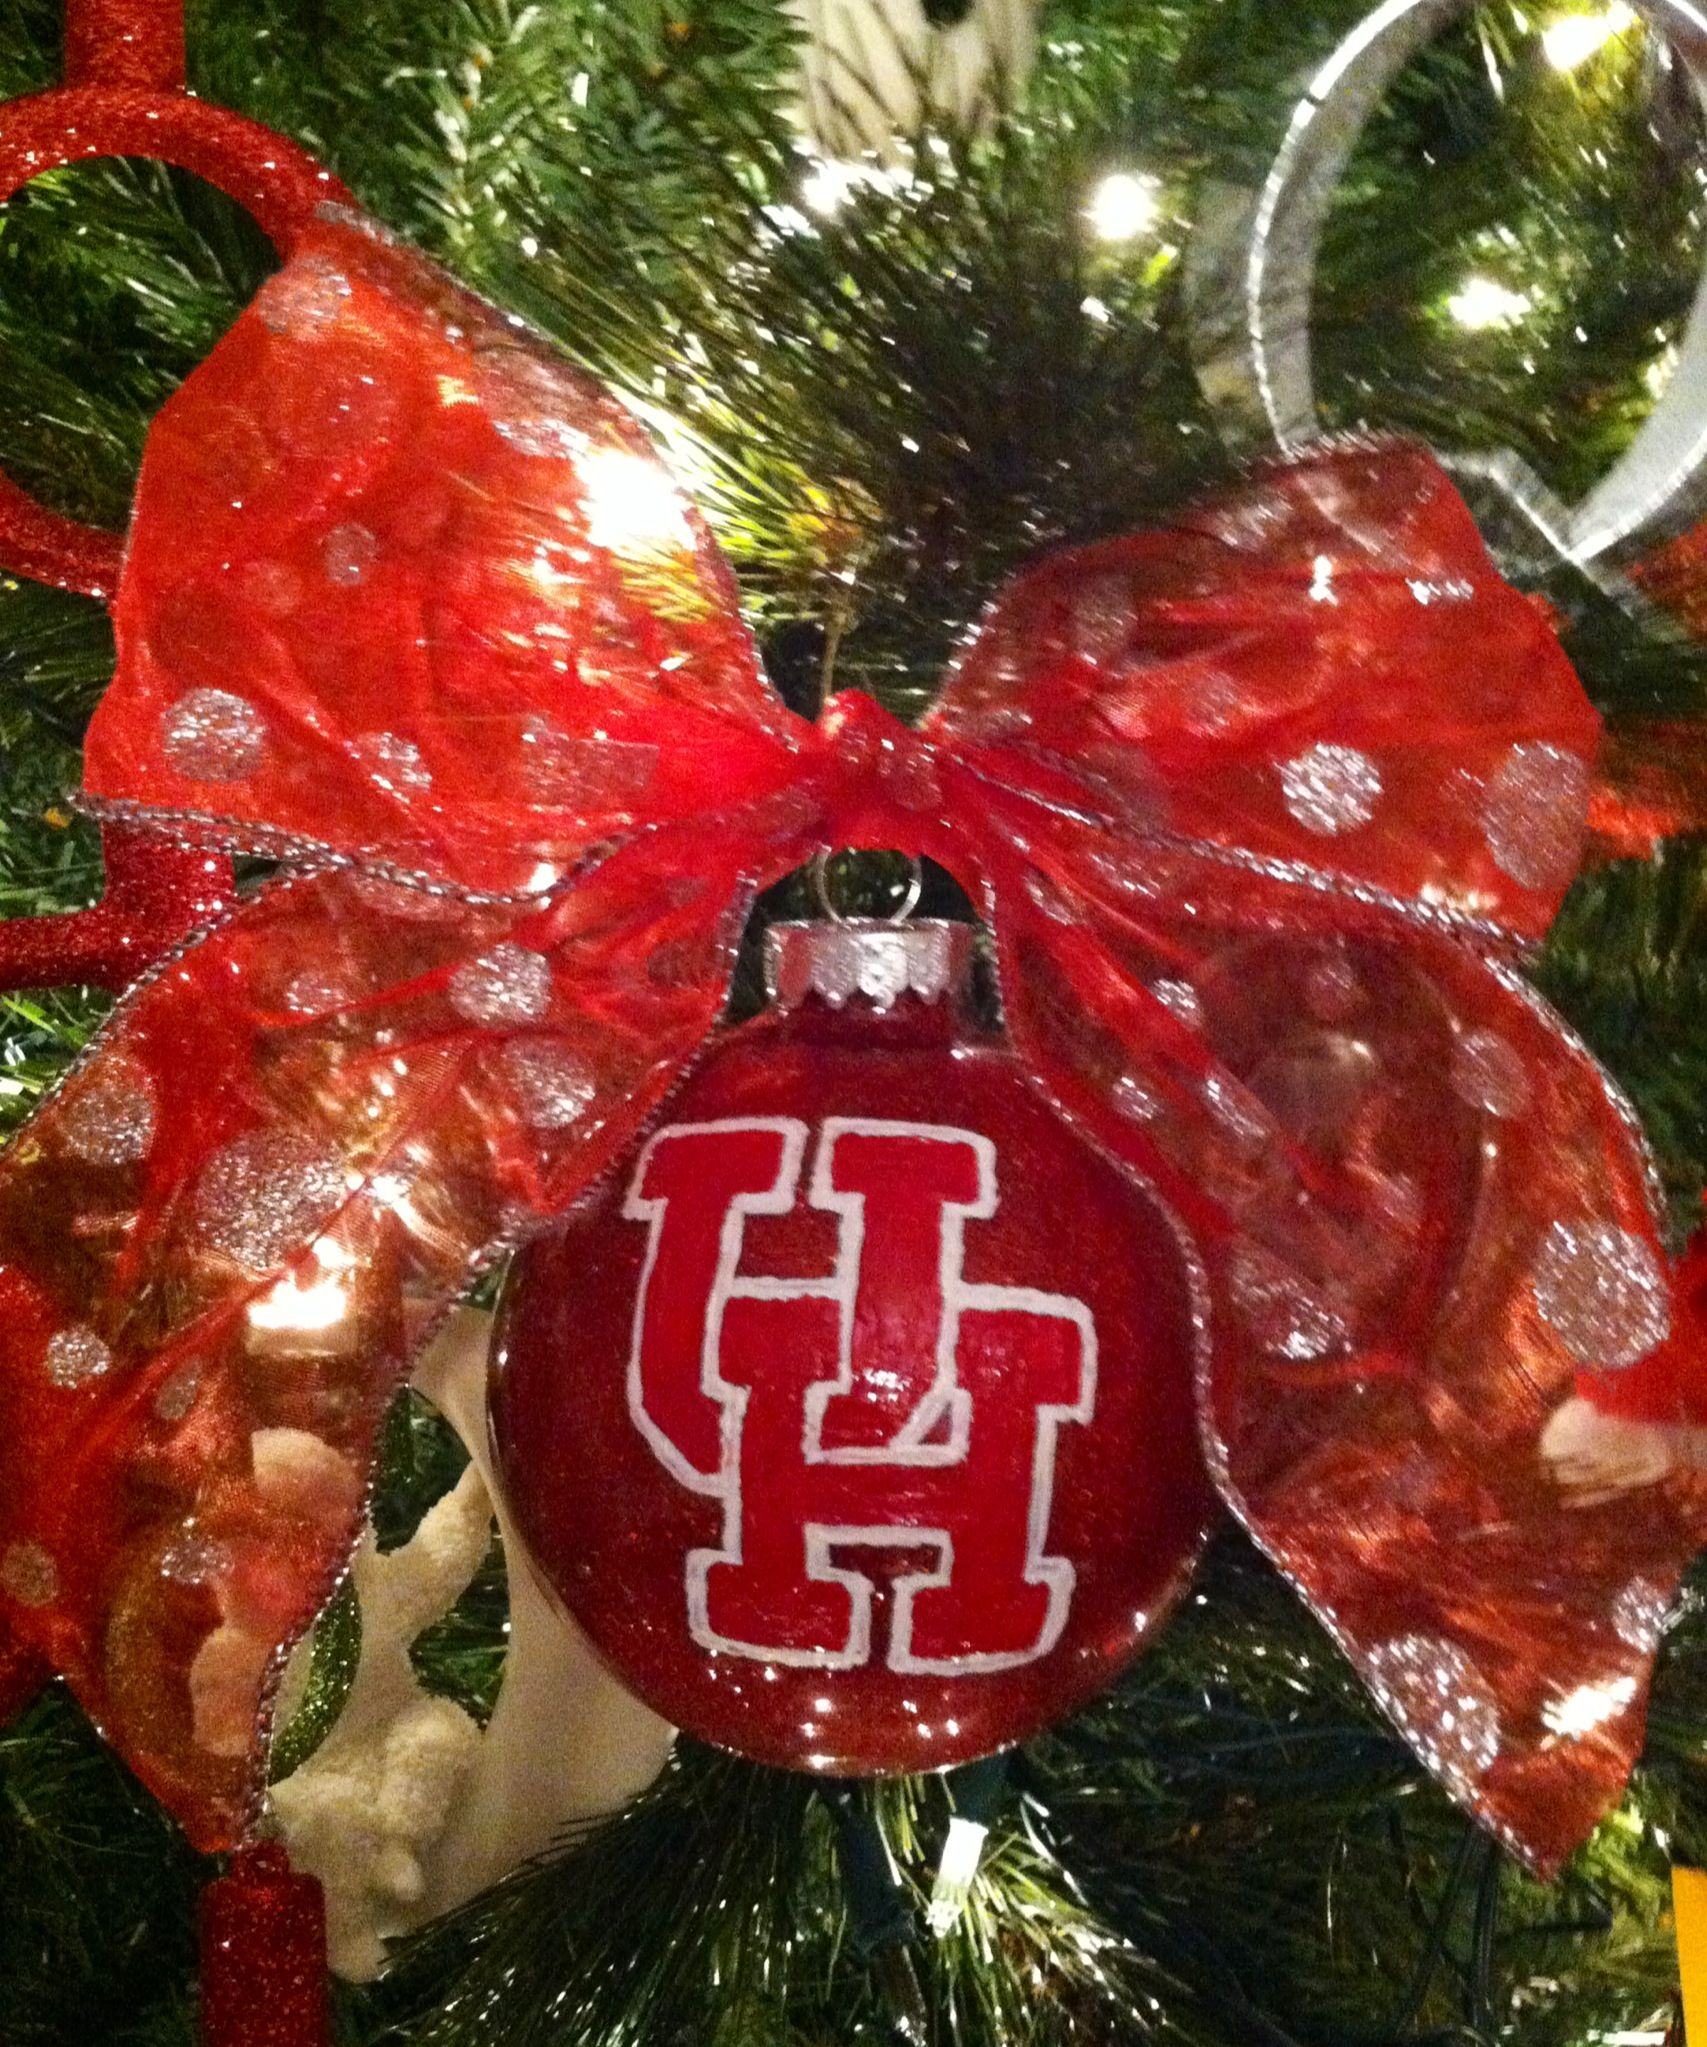 university of houston christmas ornament - Christmas Decorations Houston